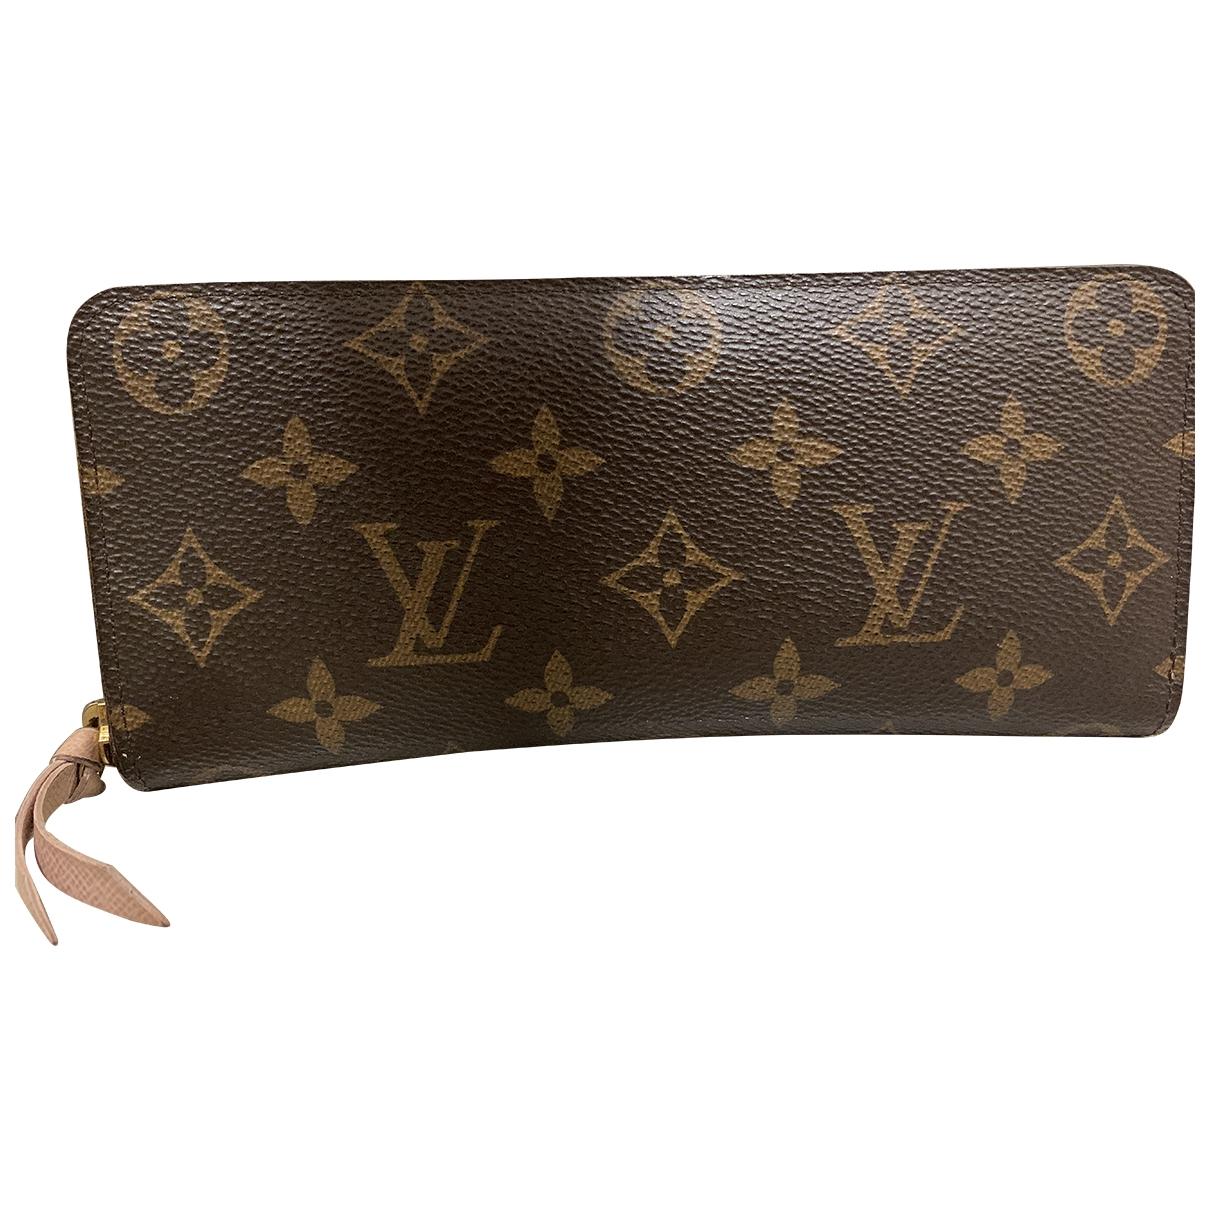 Cartera Clemence de Lona Louis Vuitton